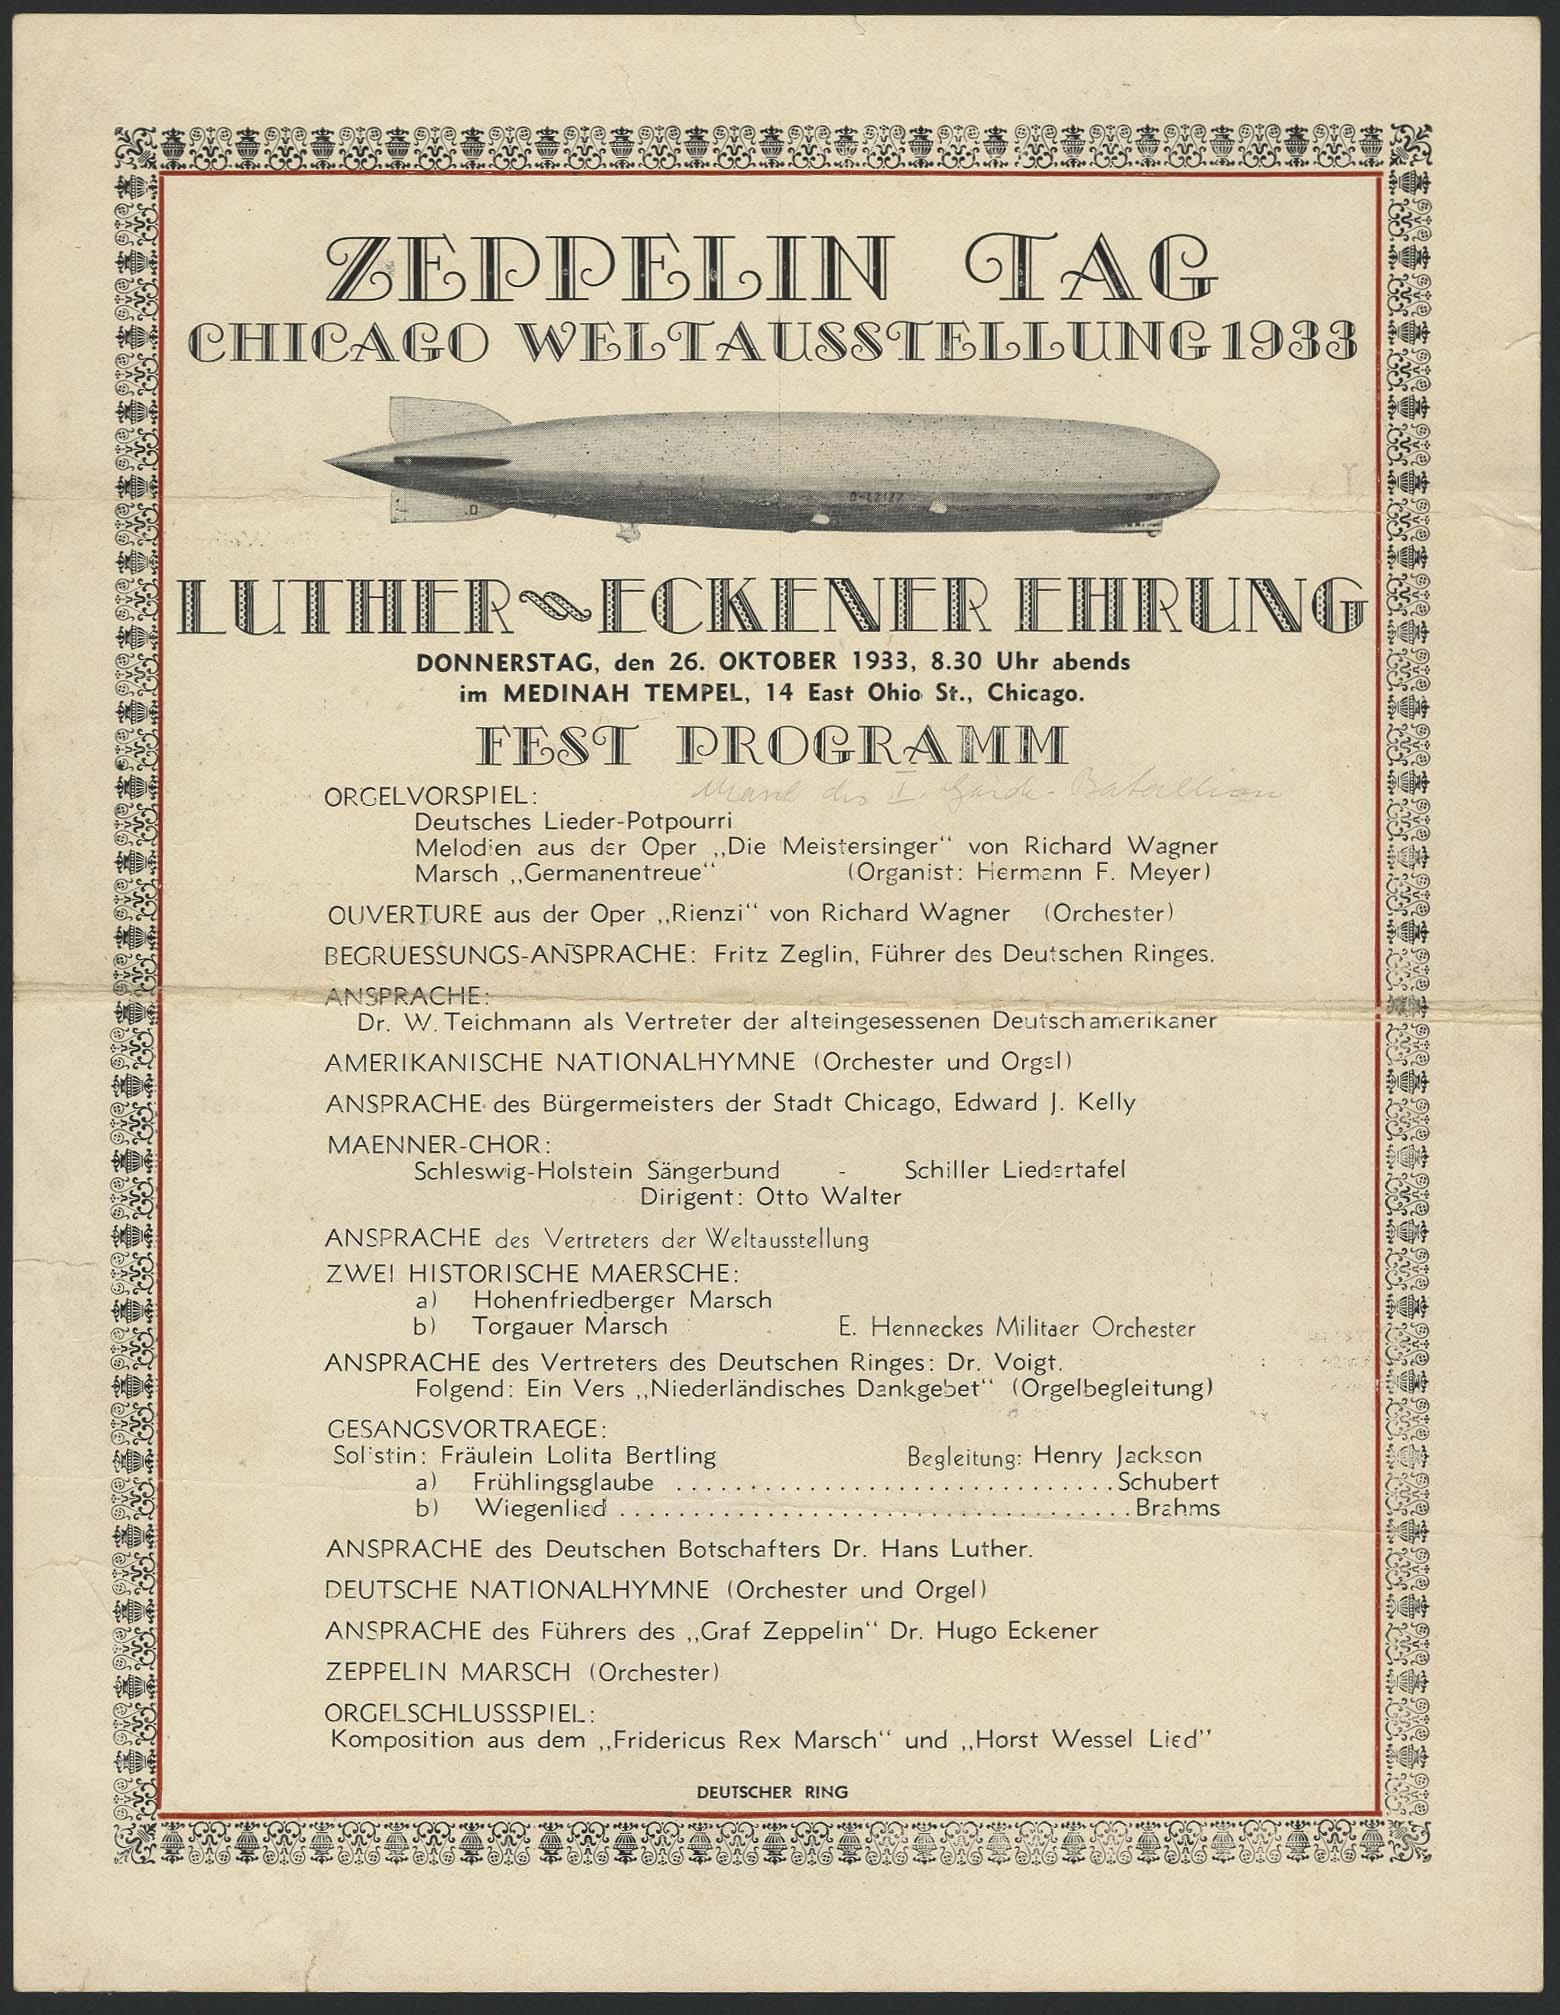 Lot 4105 - Zeppelin-Memorabilien Memorabilien -  Auktionshaus Ulrich Felzmann GmbH & Co. KG